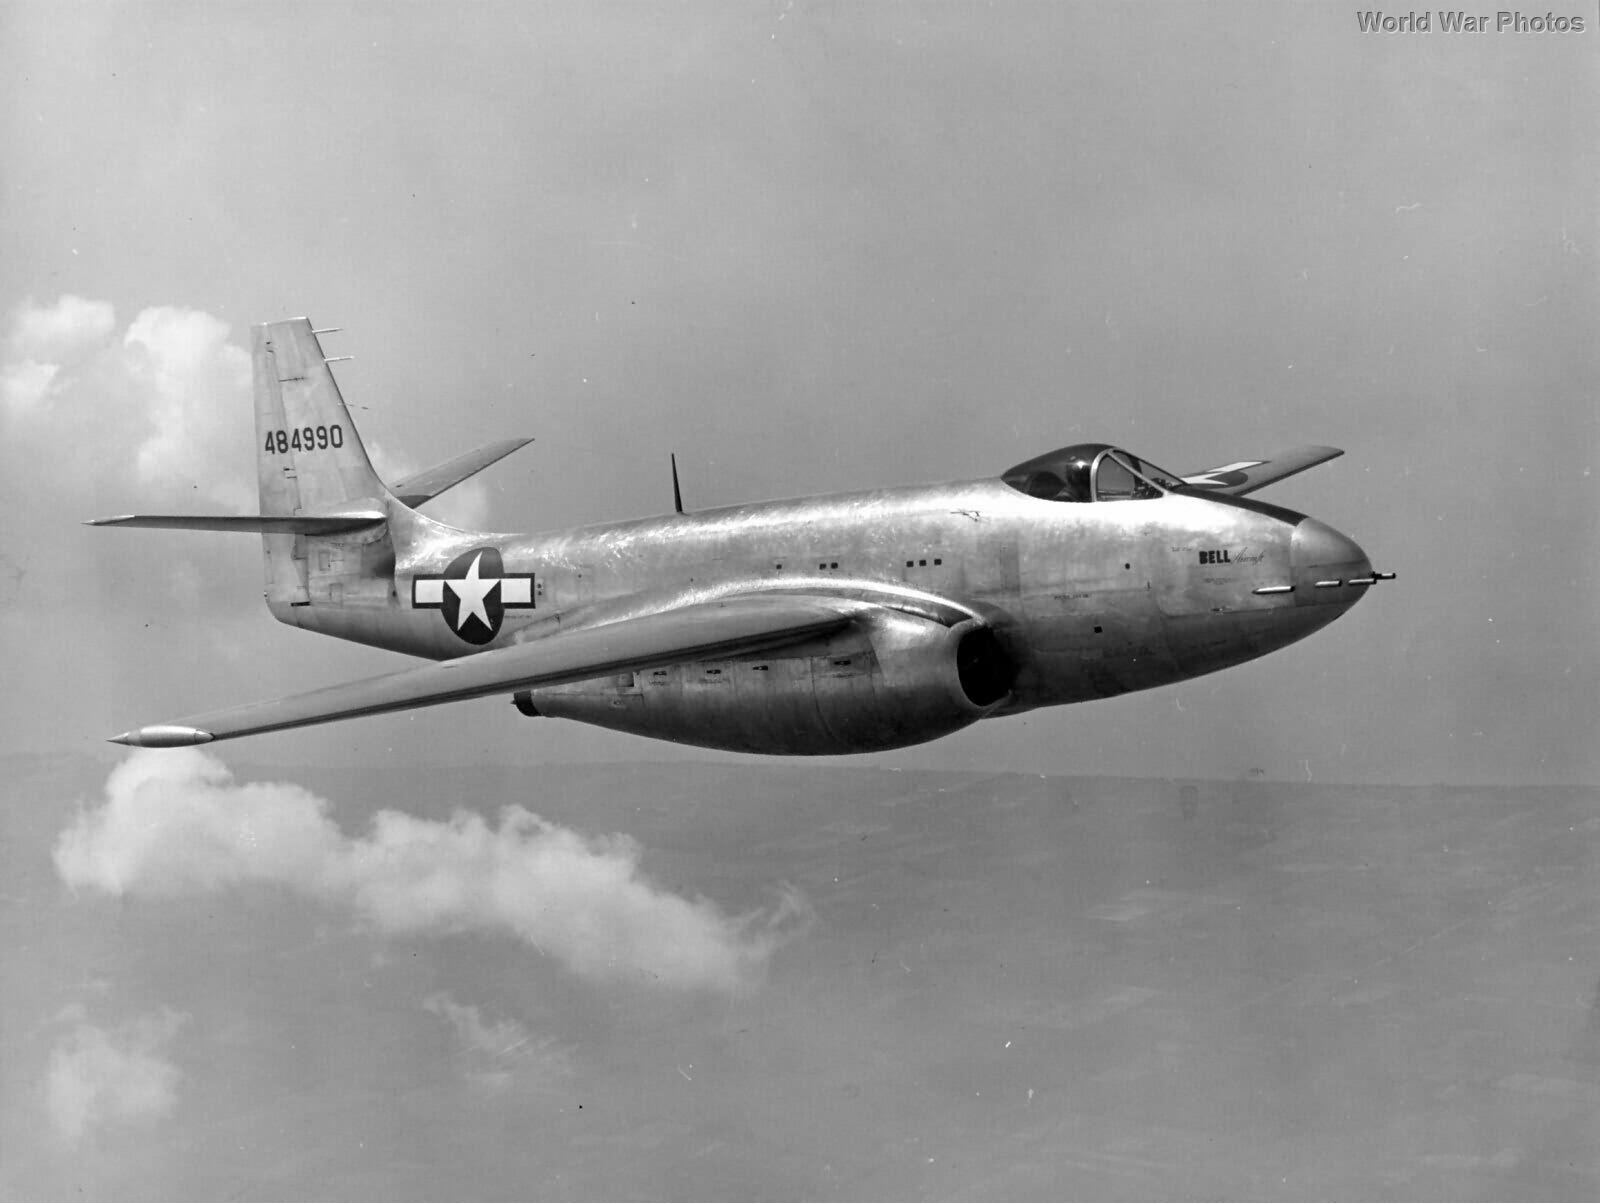 Escort jet fighter Bell XP-83 during test flight